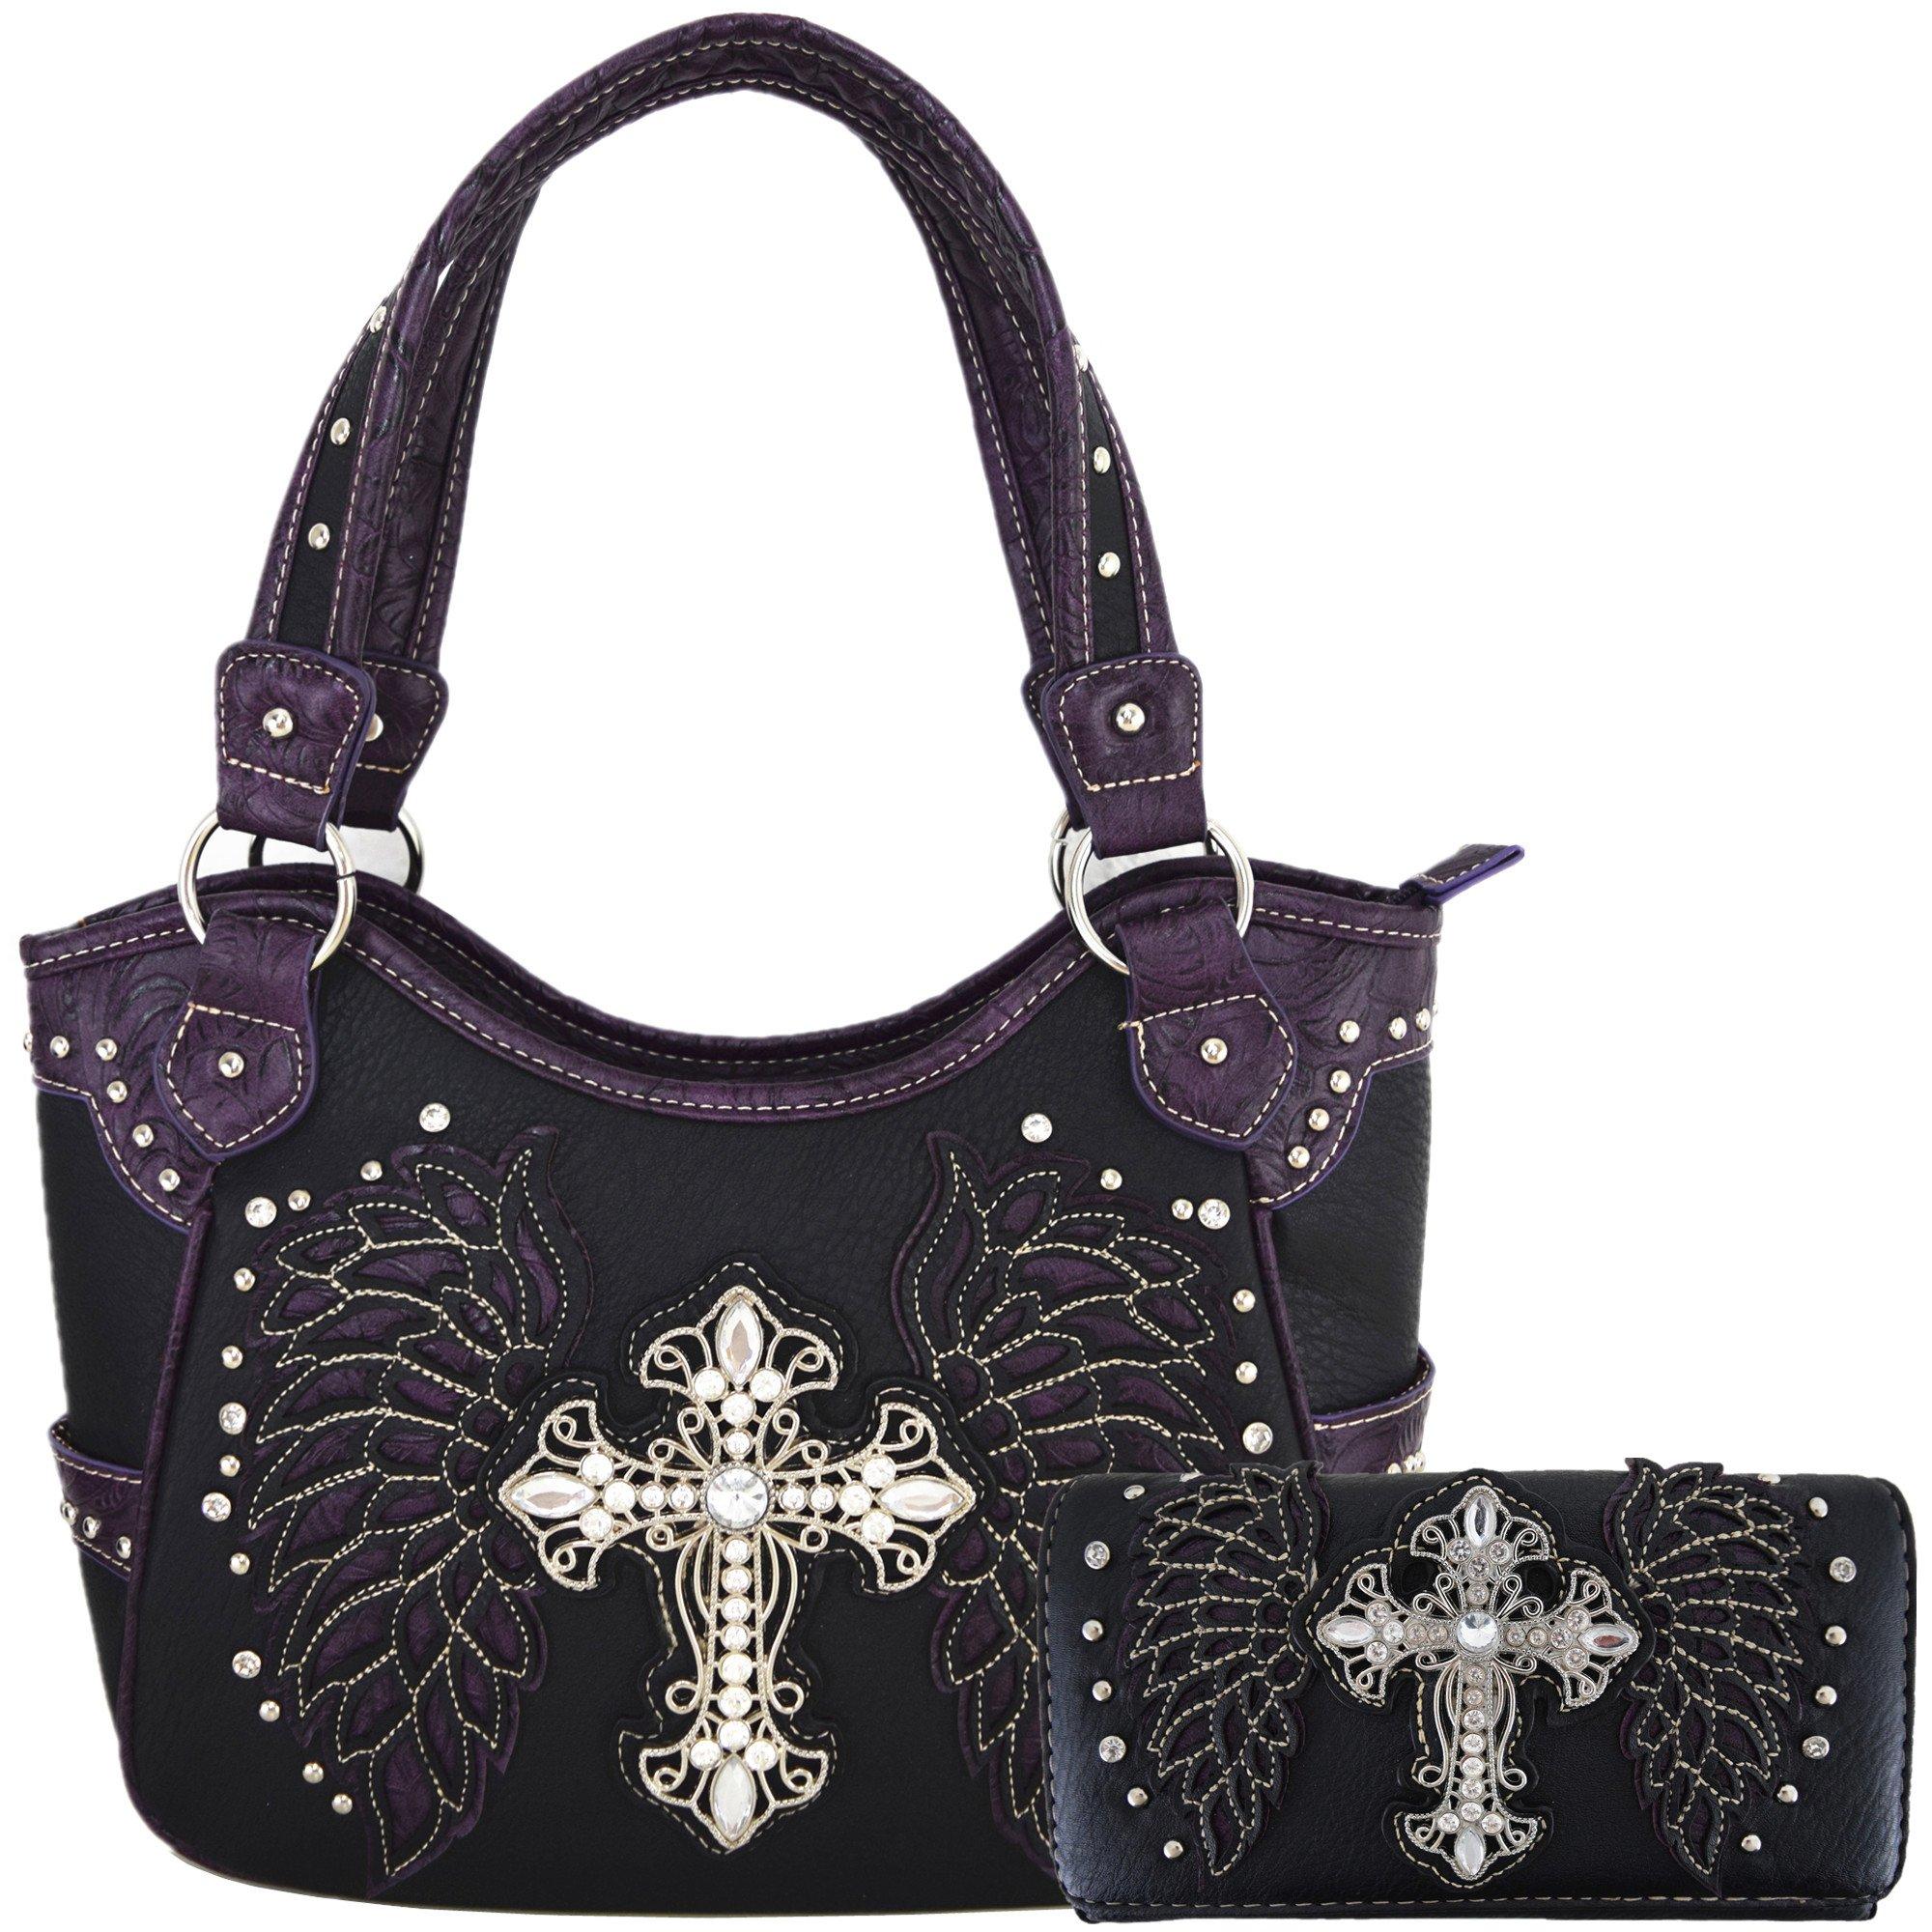 Western Style Cross Laser Cut Wings Purse Concealed Carry Handbags Women Country Shoulder Bag Wallet Set (Black/Purple Set)